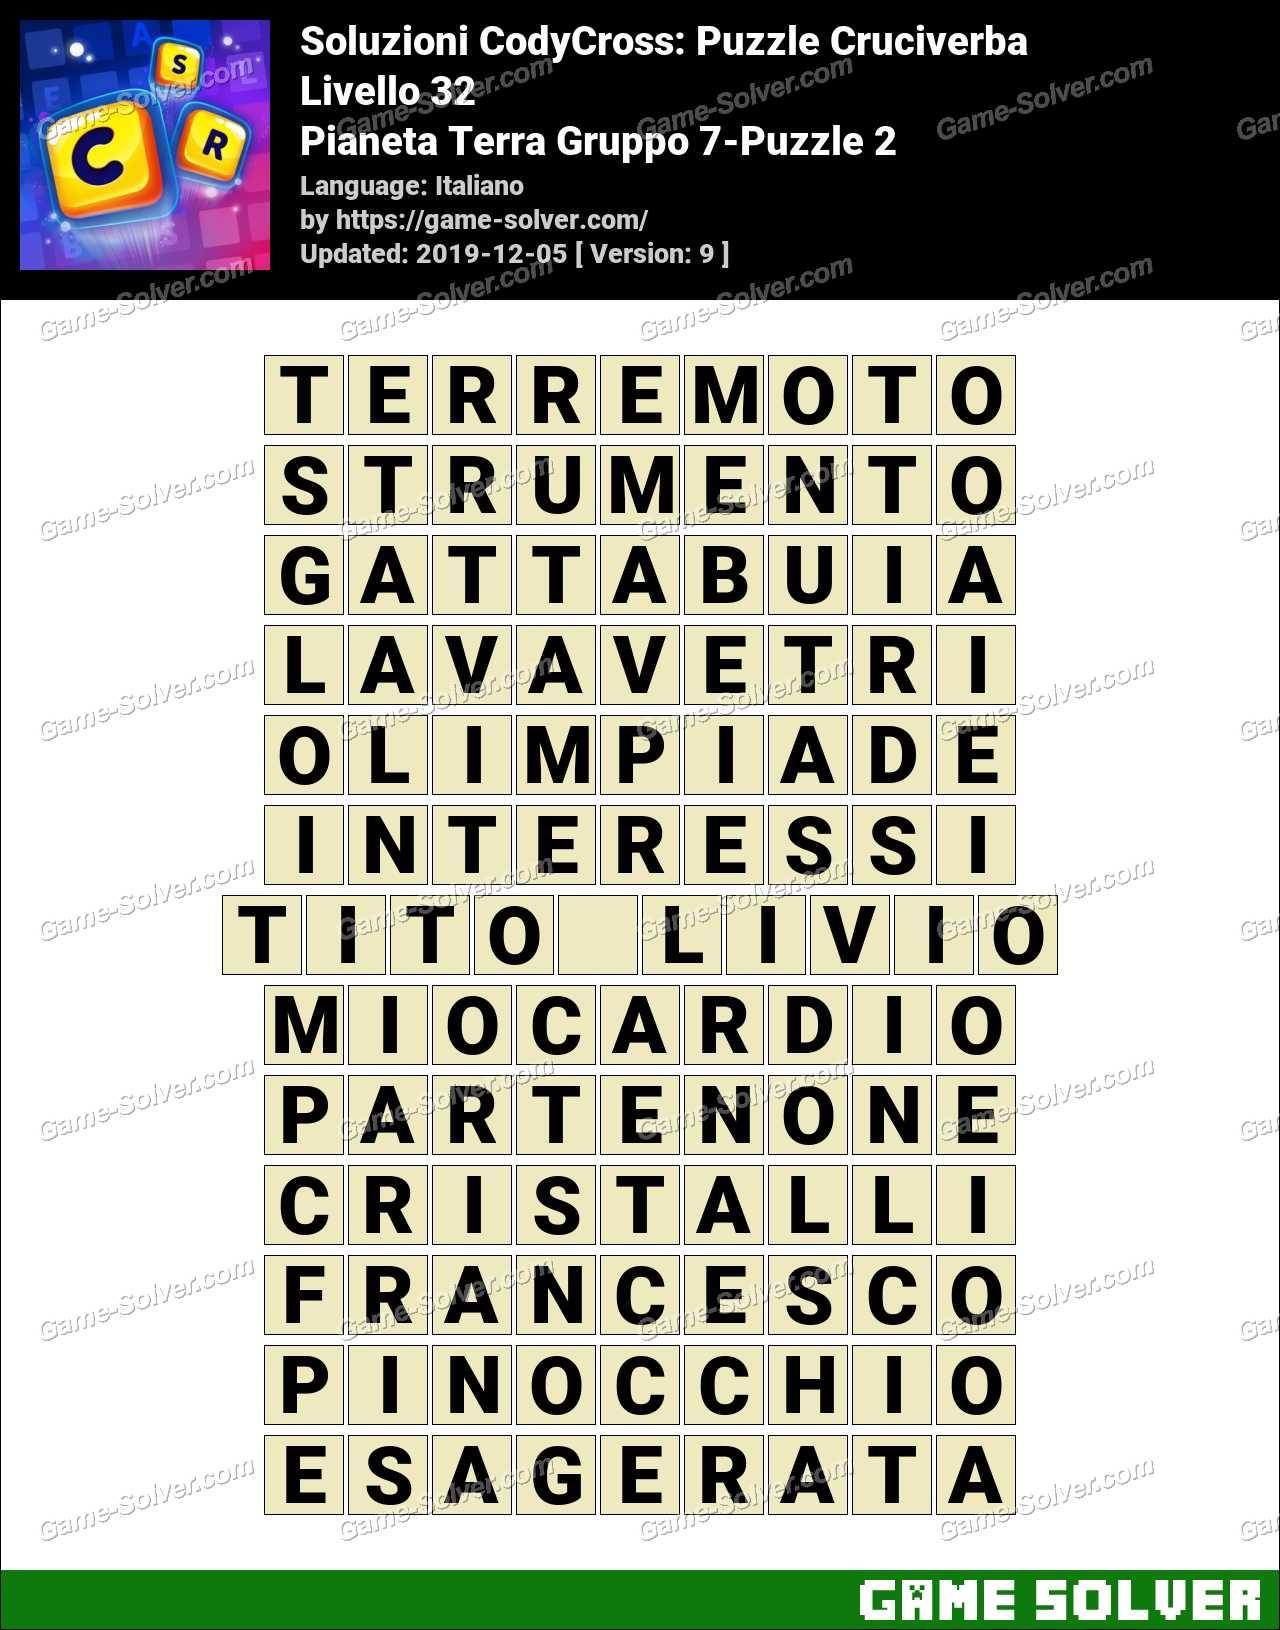 Soluzioni CodyCross Pianeta Terra Gruppo 7-Puzzle 2